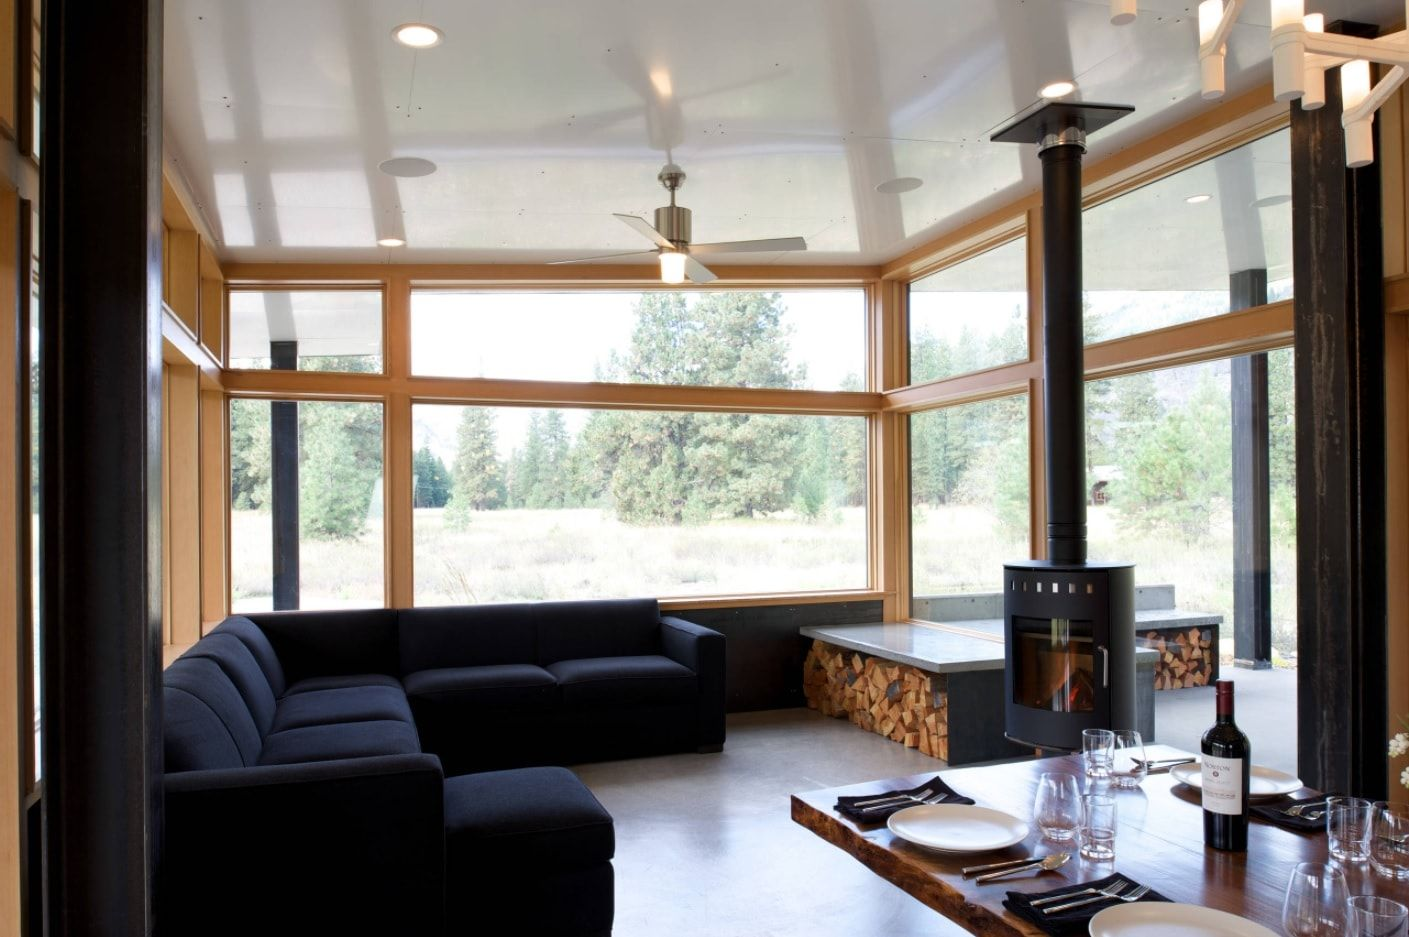 Eco minimalism for modern cottage in dark/light contrast